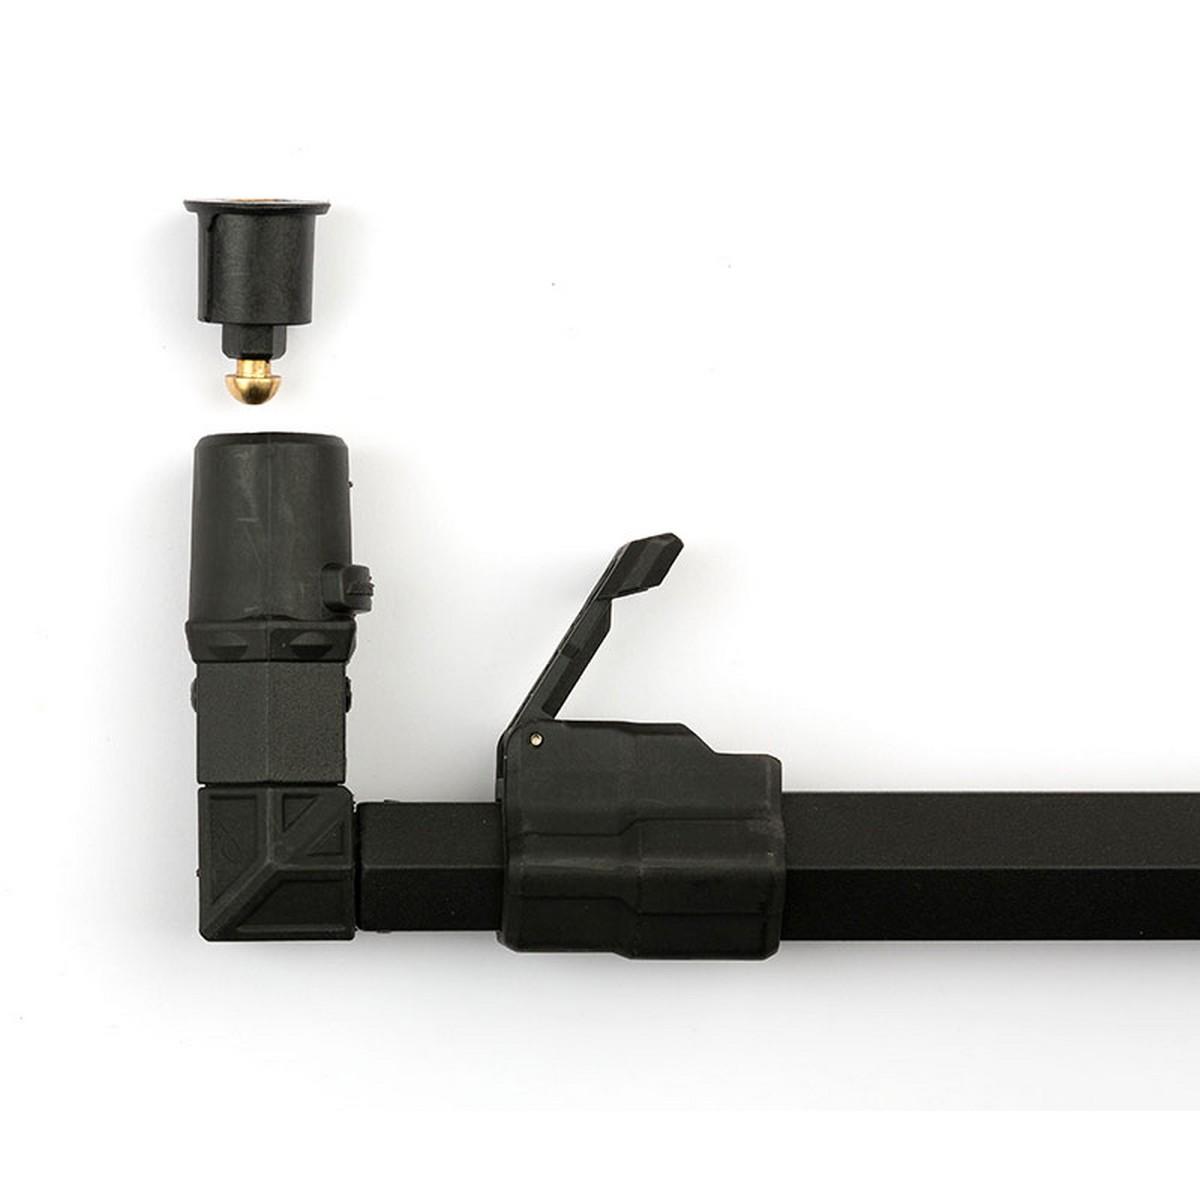 Прикачна за платформа Matrix 3D-R Feeder Arm Long - Универсално дълго телескопично рамо